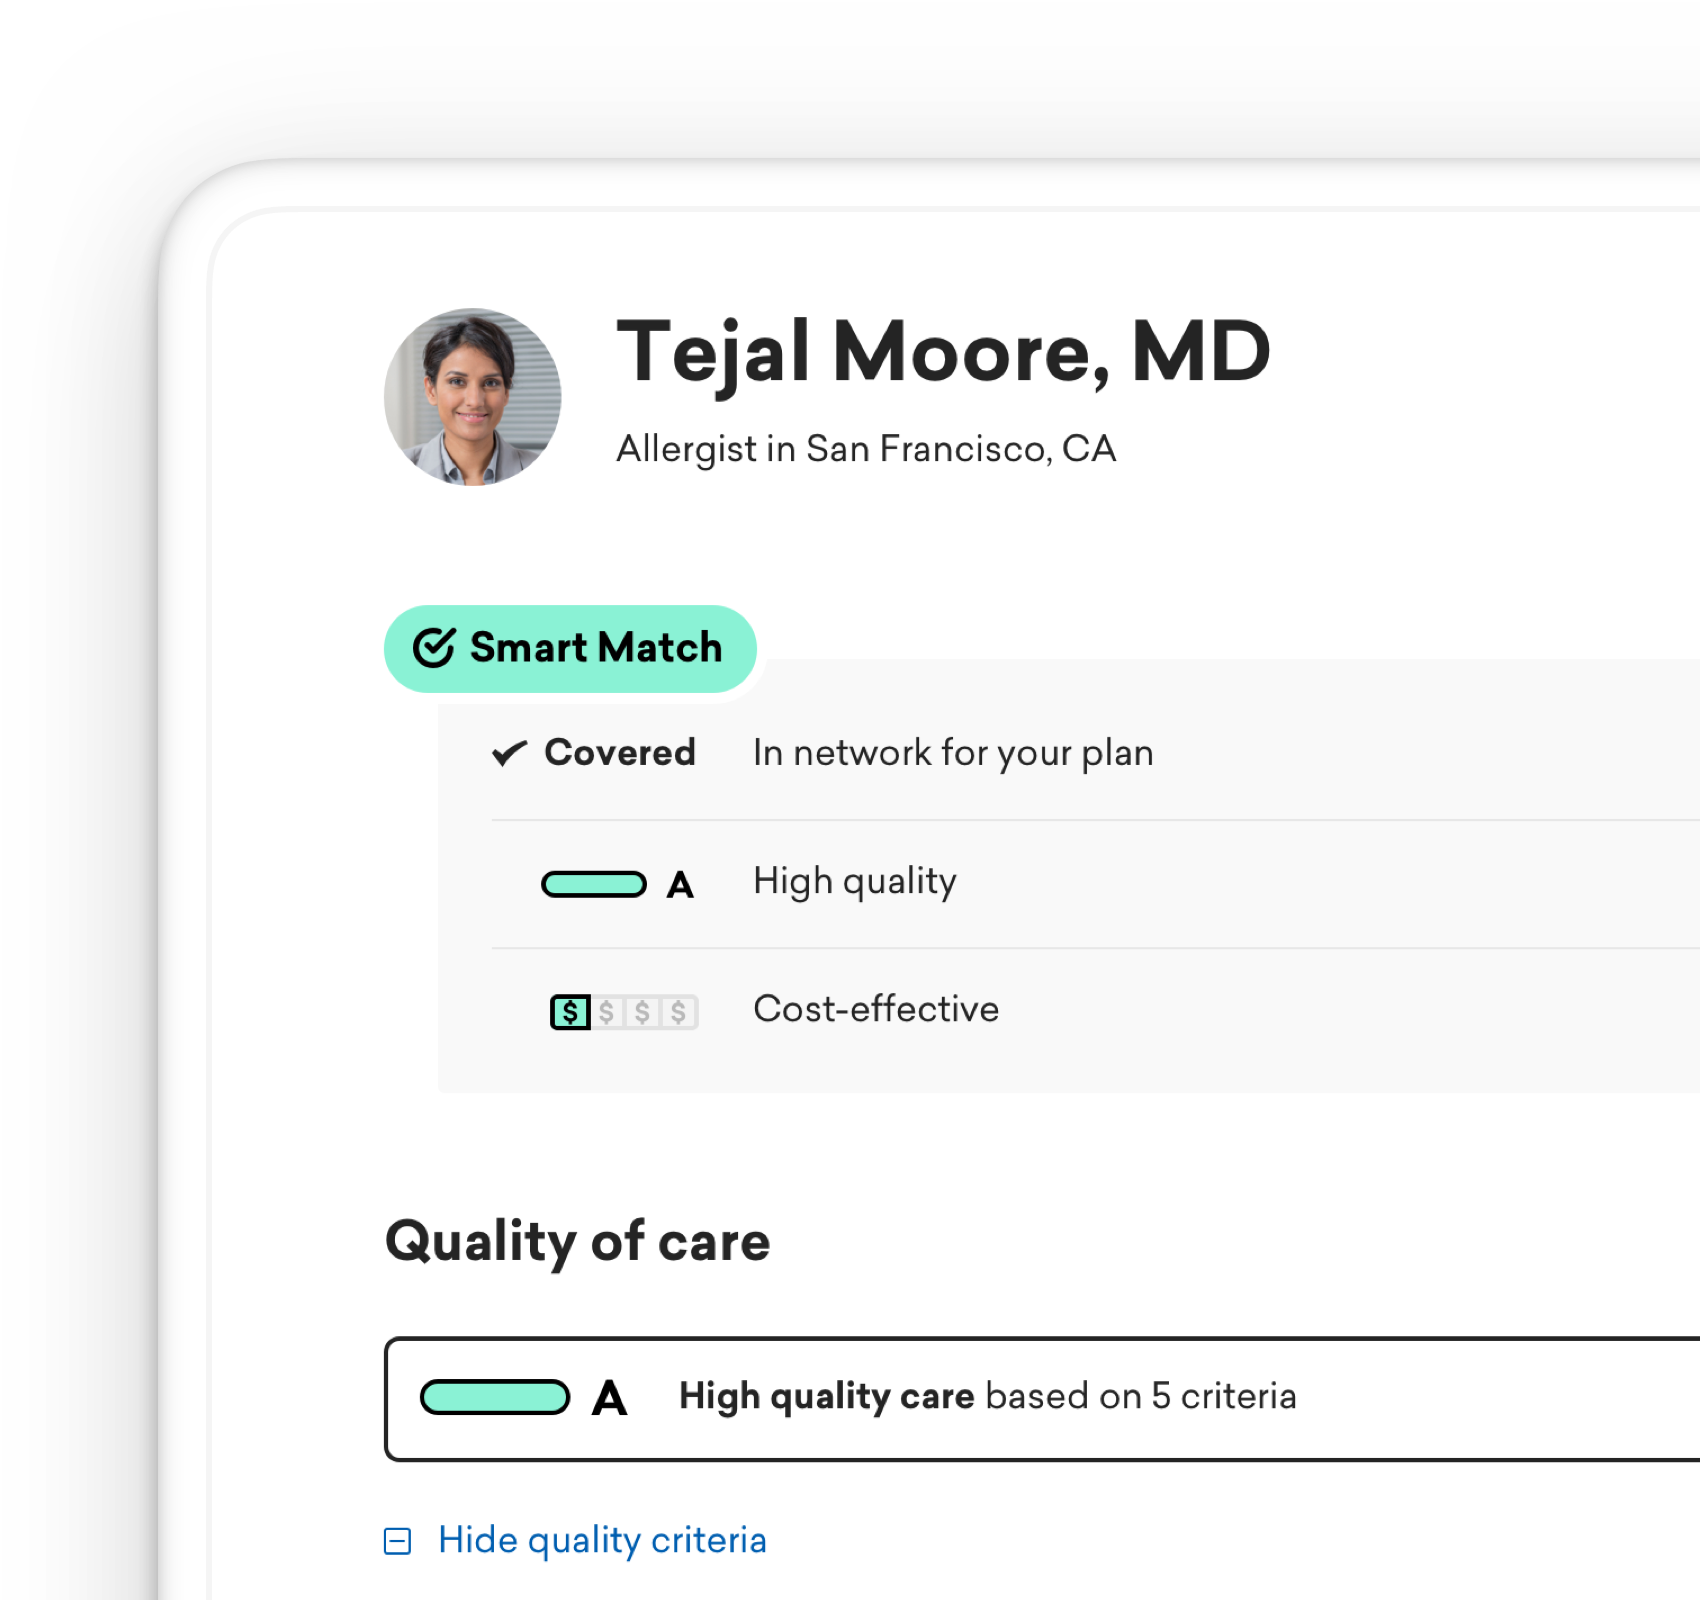 Partial screenshot of provider profile